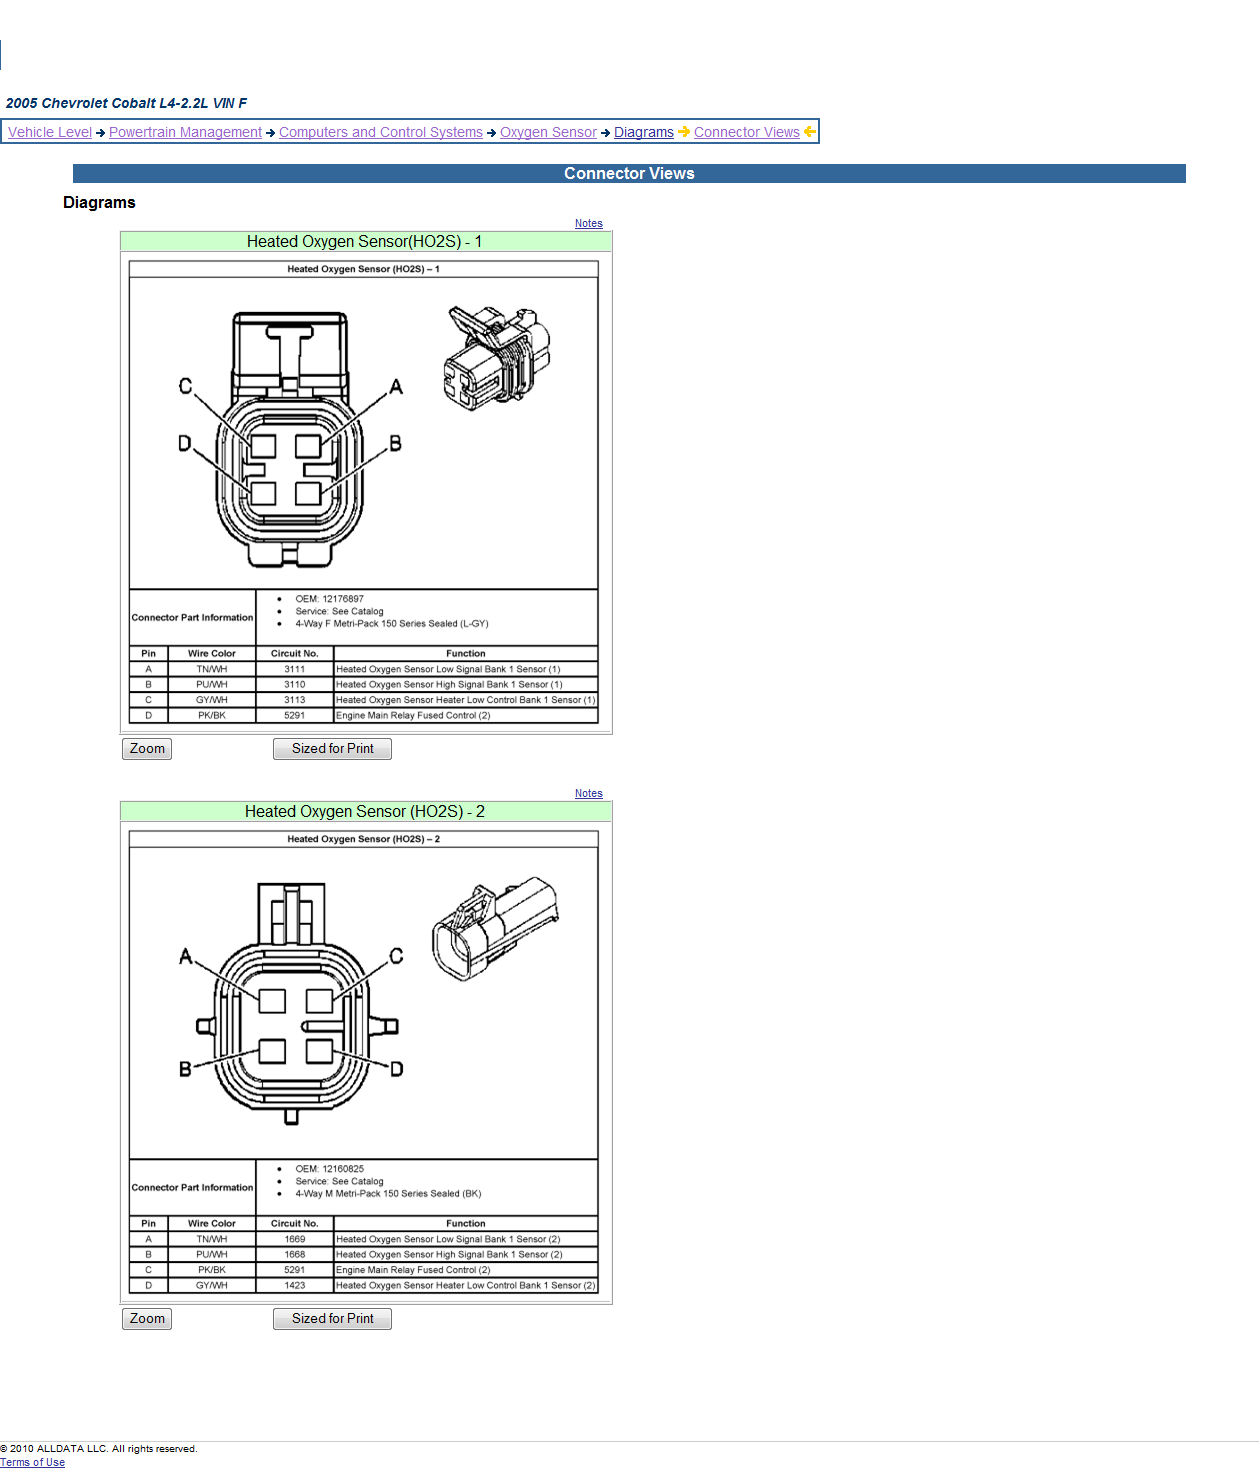 Wiring 4 Wire Schematic | Wiring Library - 4 Wire O2 Sensor Wiring Diagram